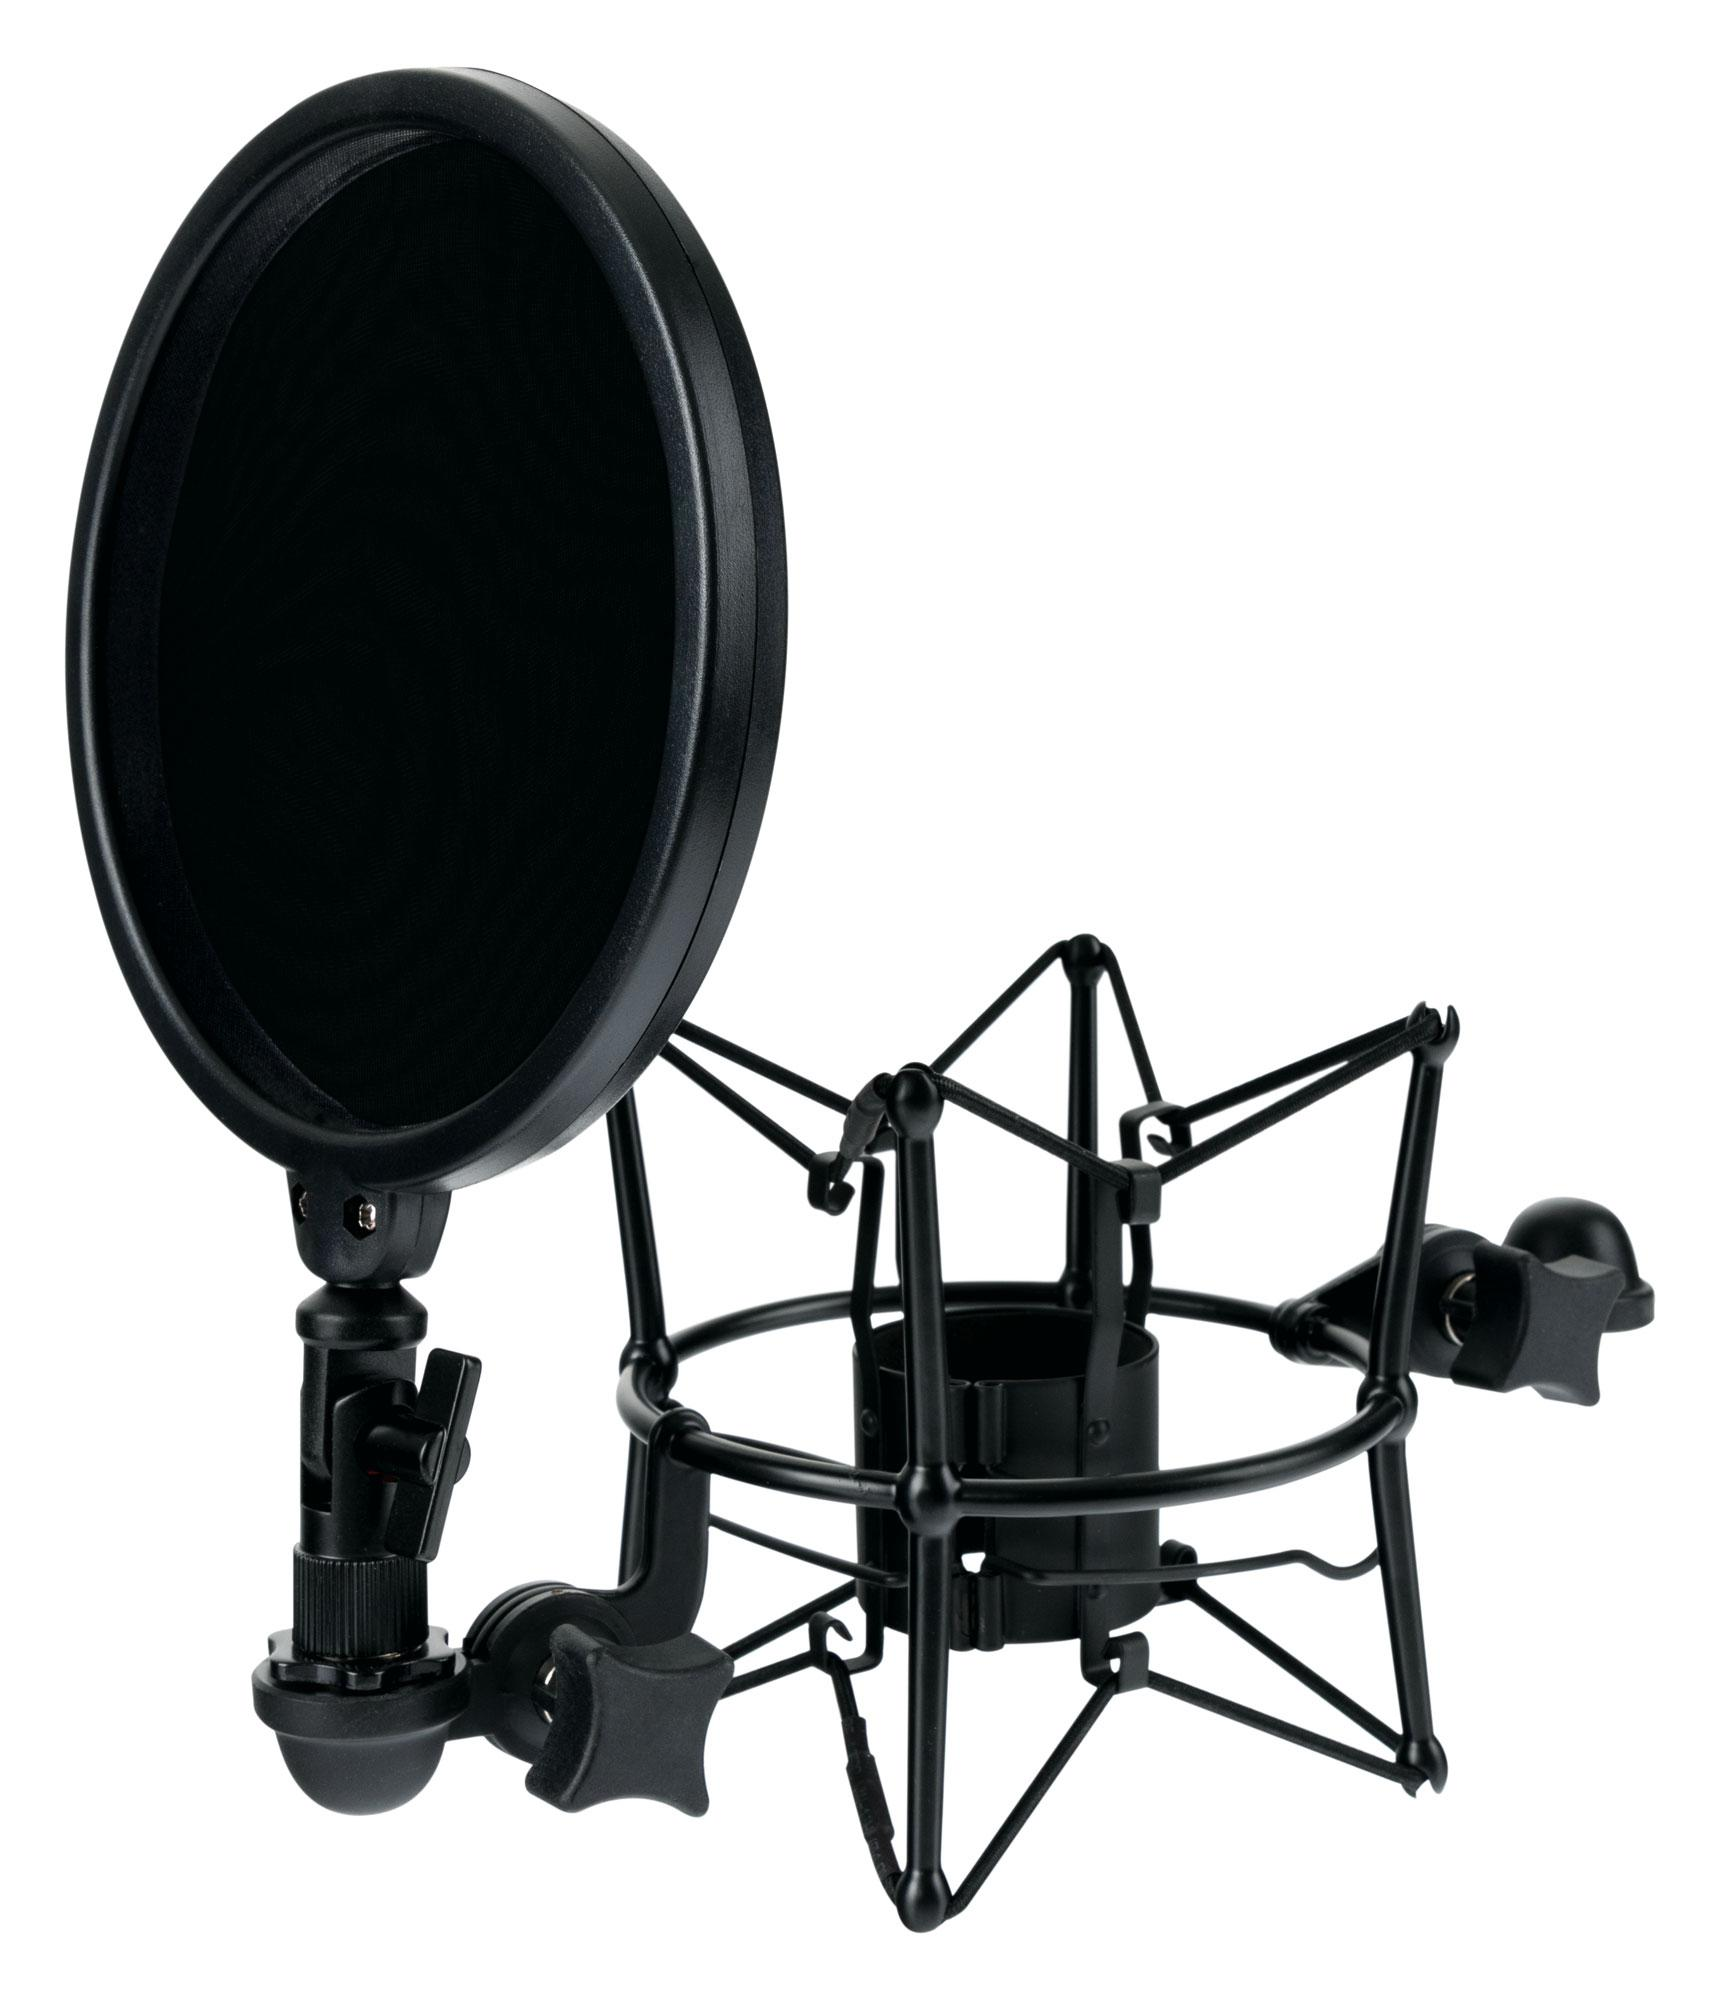 Studiozubehoer - Pronomic MSP 45 Mikrofonspinne mit Popschutz 45 52mm - Onlineshop Musikhaus Kirstein